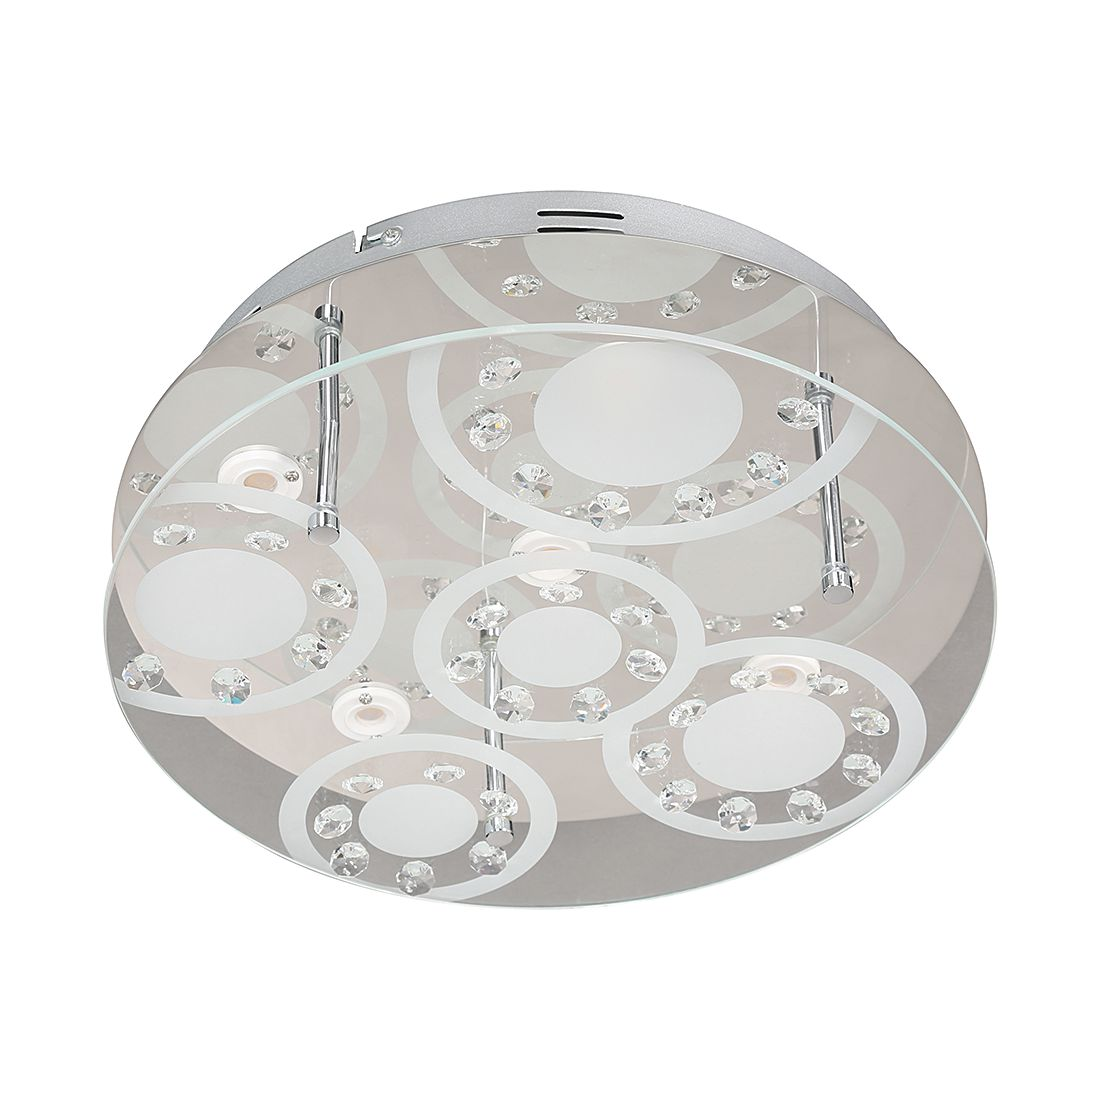 energie  A+, Plafondlamp TROJA - metaal/glas - 5 lichtbronnen, Wofi